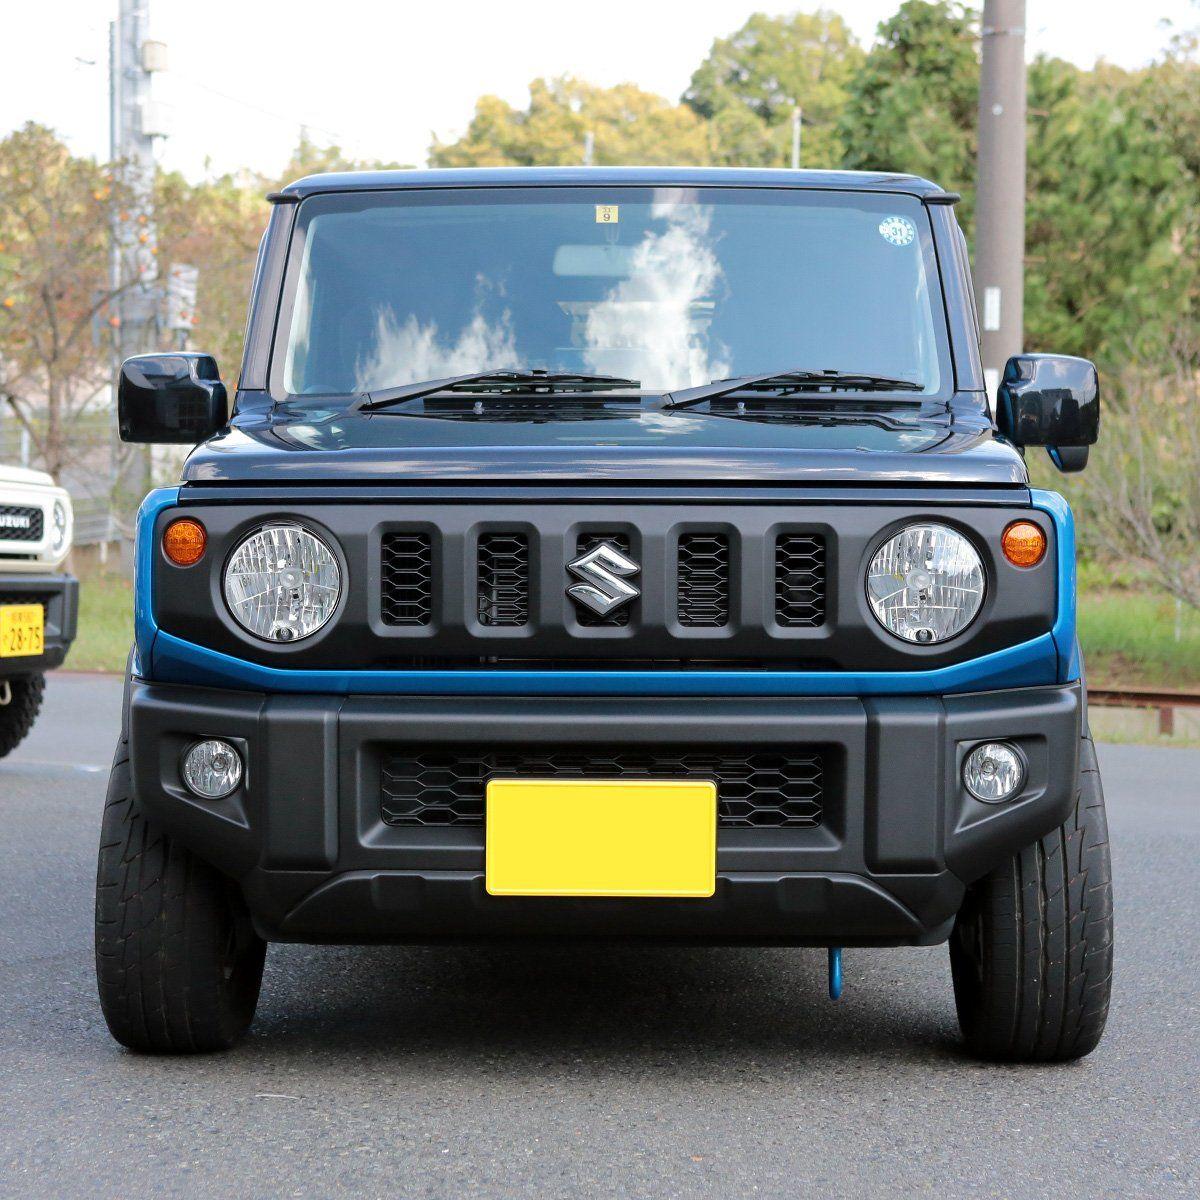 Apio Jimnycustom Auf Twitter Flexdream社製ジムニーjb64 Jb74用ペンドルトンシートカバー1台分セット ジムニーショップアピオにて受注承っております 装着車両を店頭に展示しておりますのでぜひご来店下さい 1台セット Suzuki Jimny Suzuki Vehicles